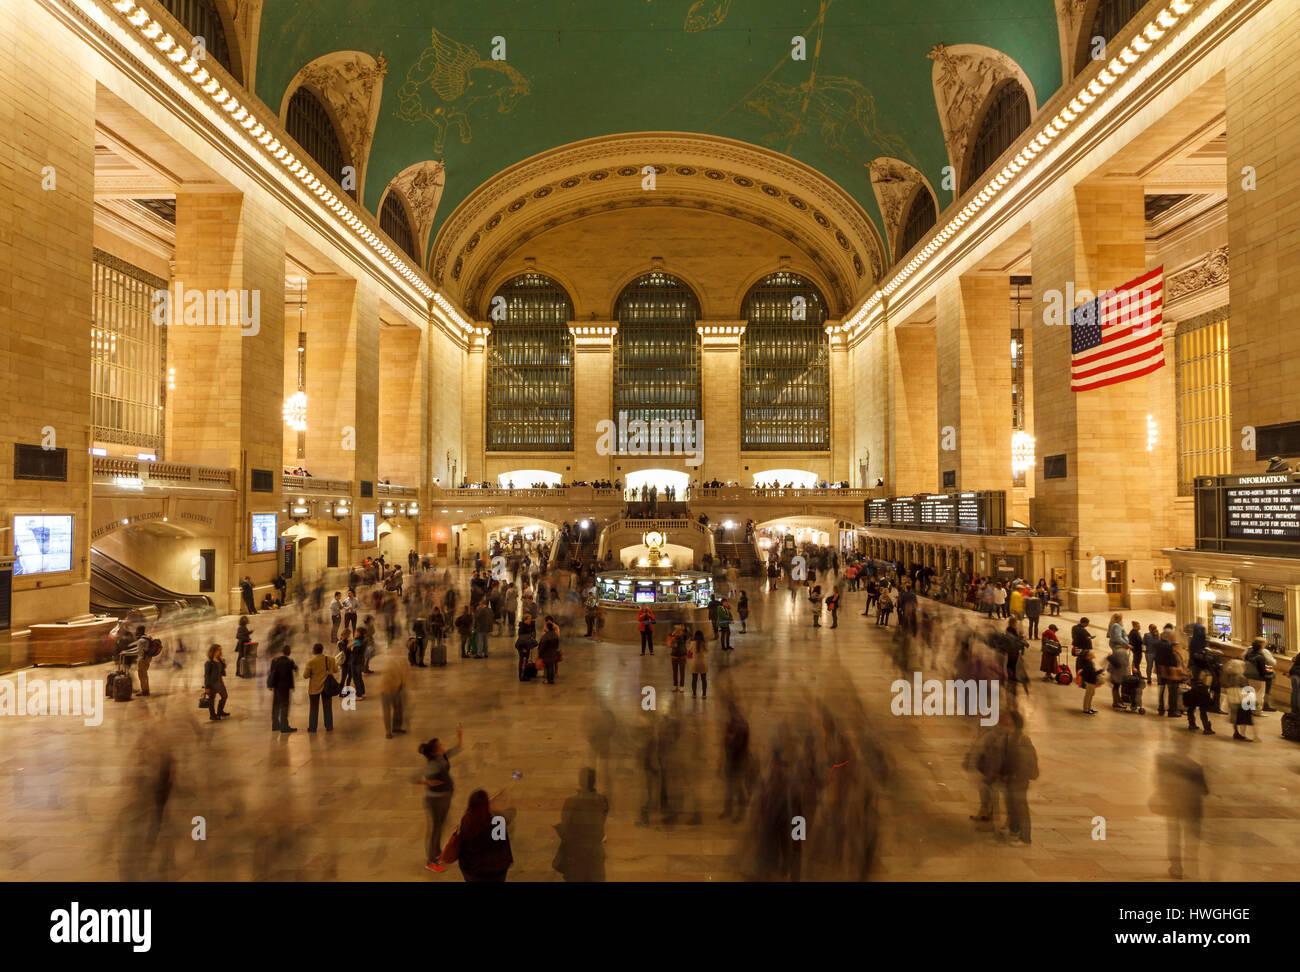 Grand Central Terminal, Manhattan, New York City, New York, USA - Stock Image